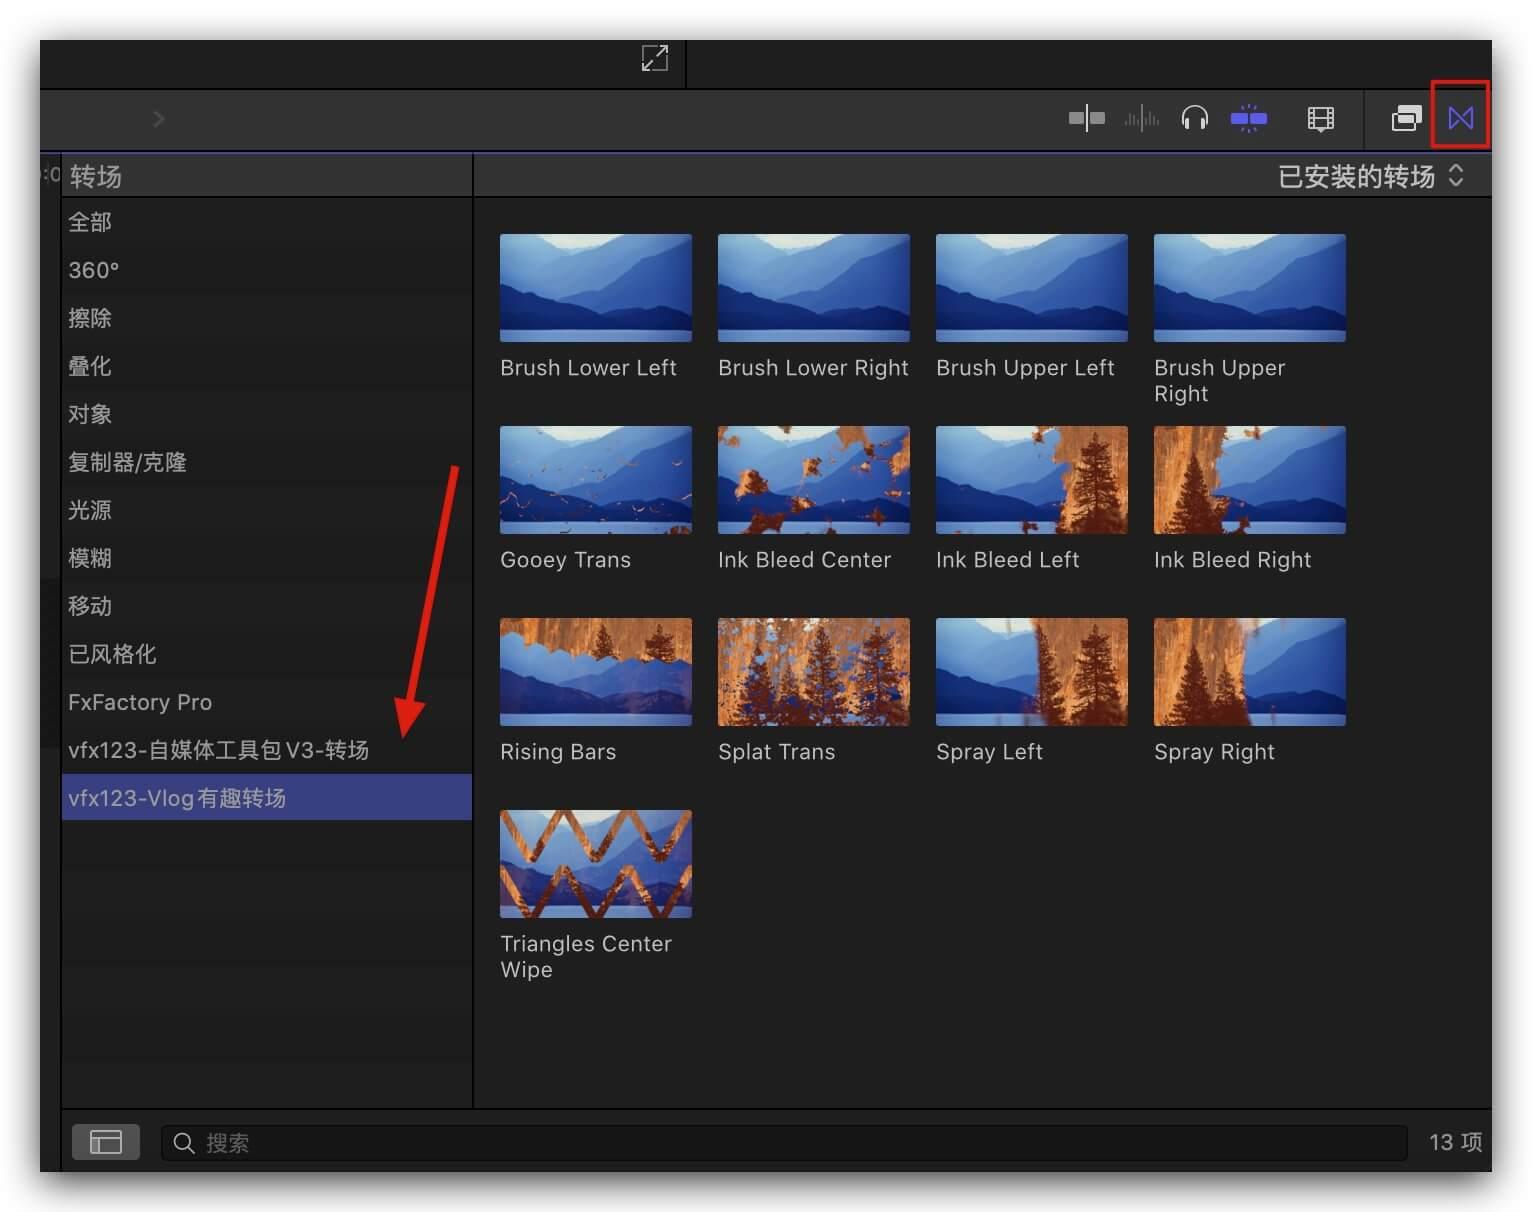 fcpx转场插件 13个有趣Vlog常用过渡转场 Transitions